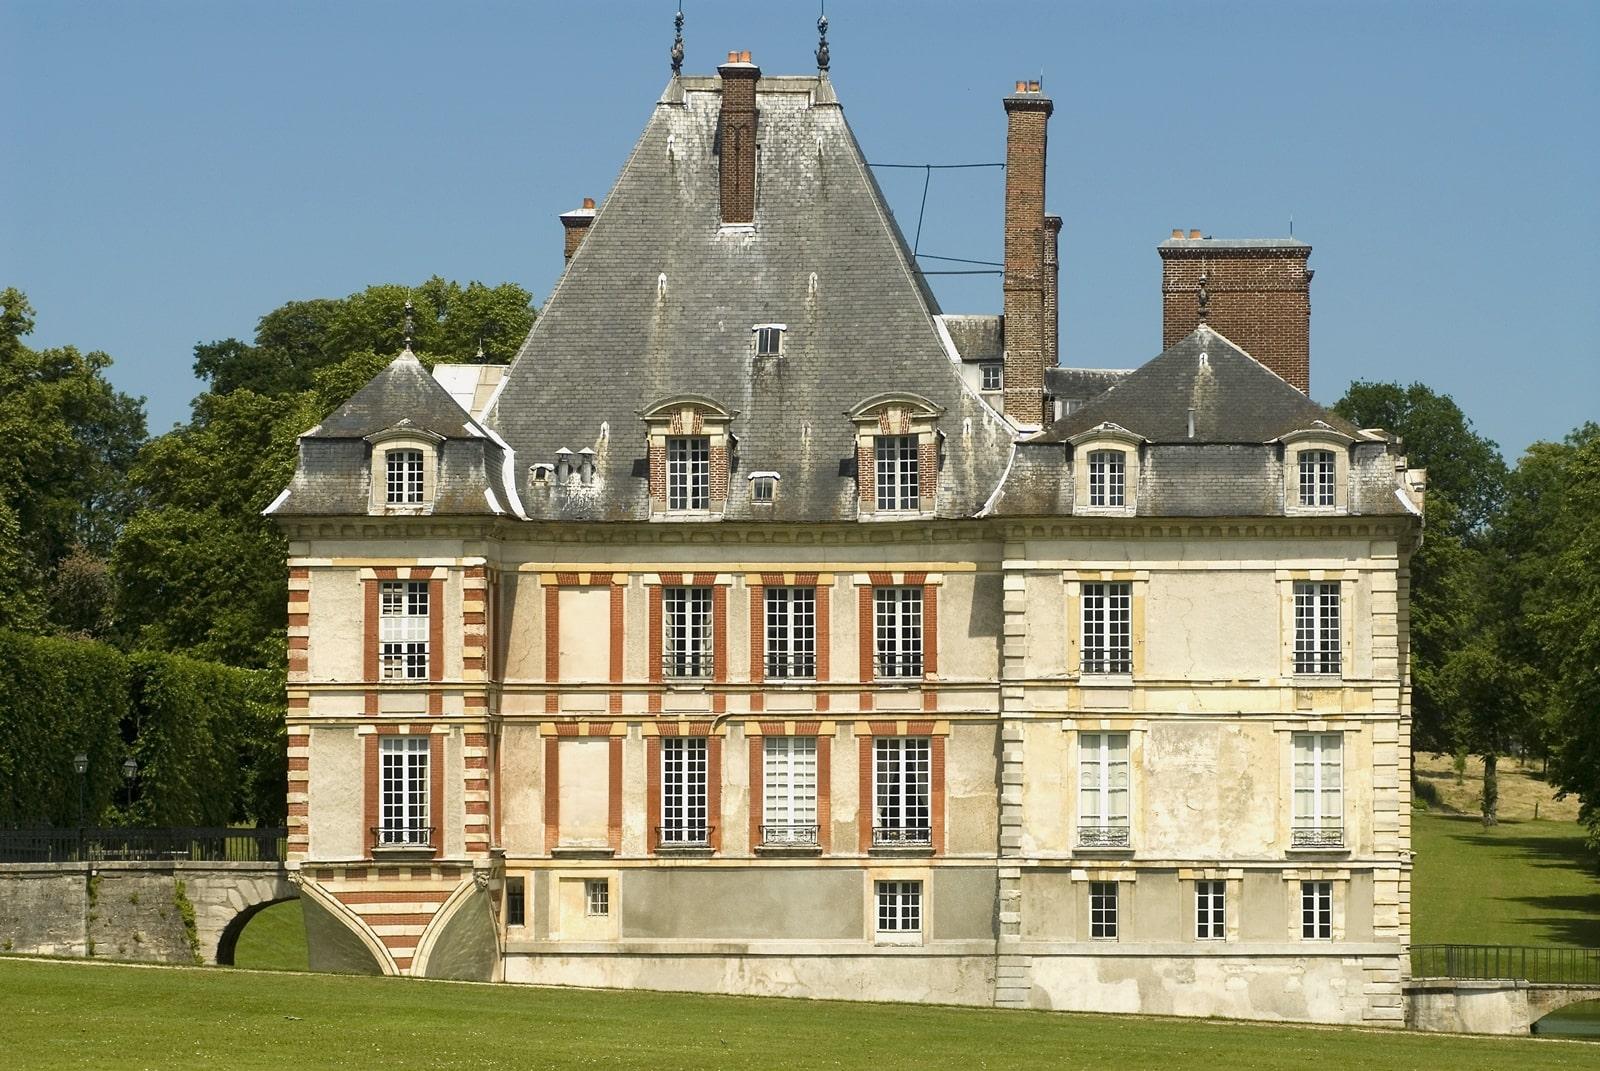 Chateau-Ormesson-5